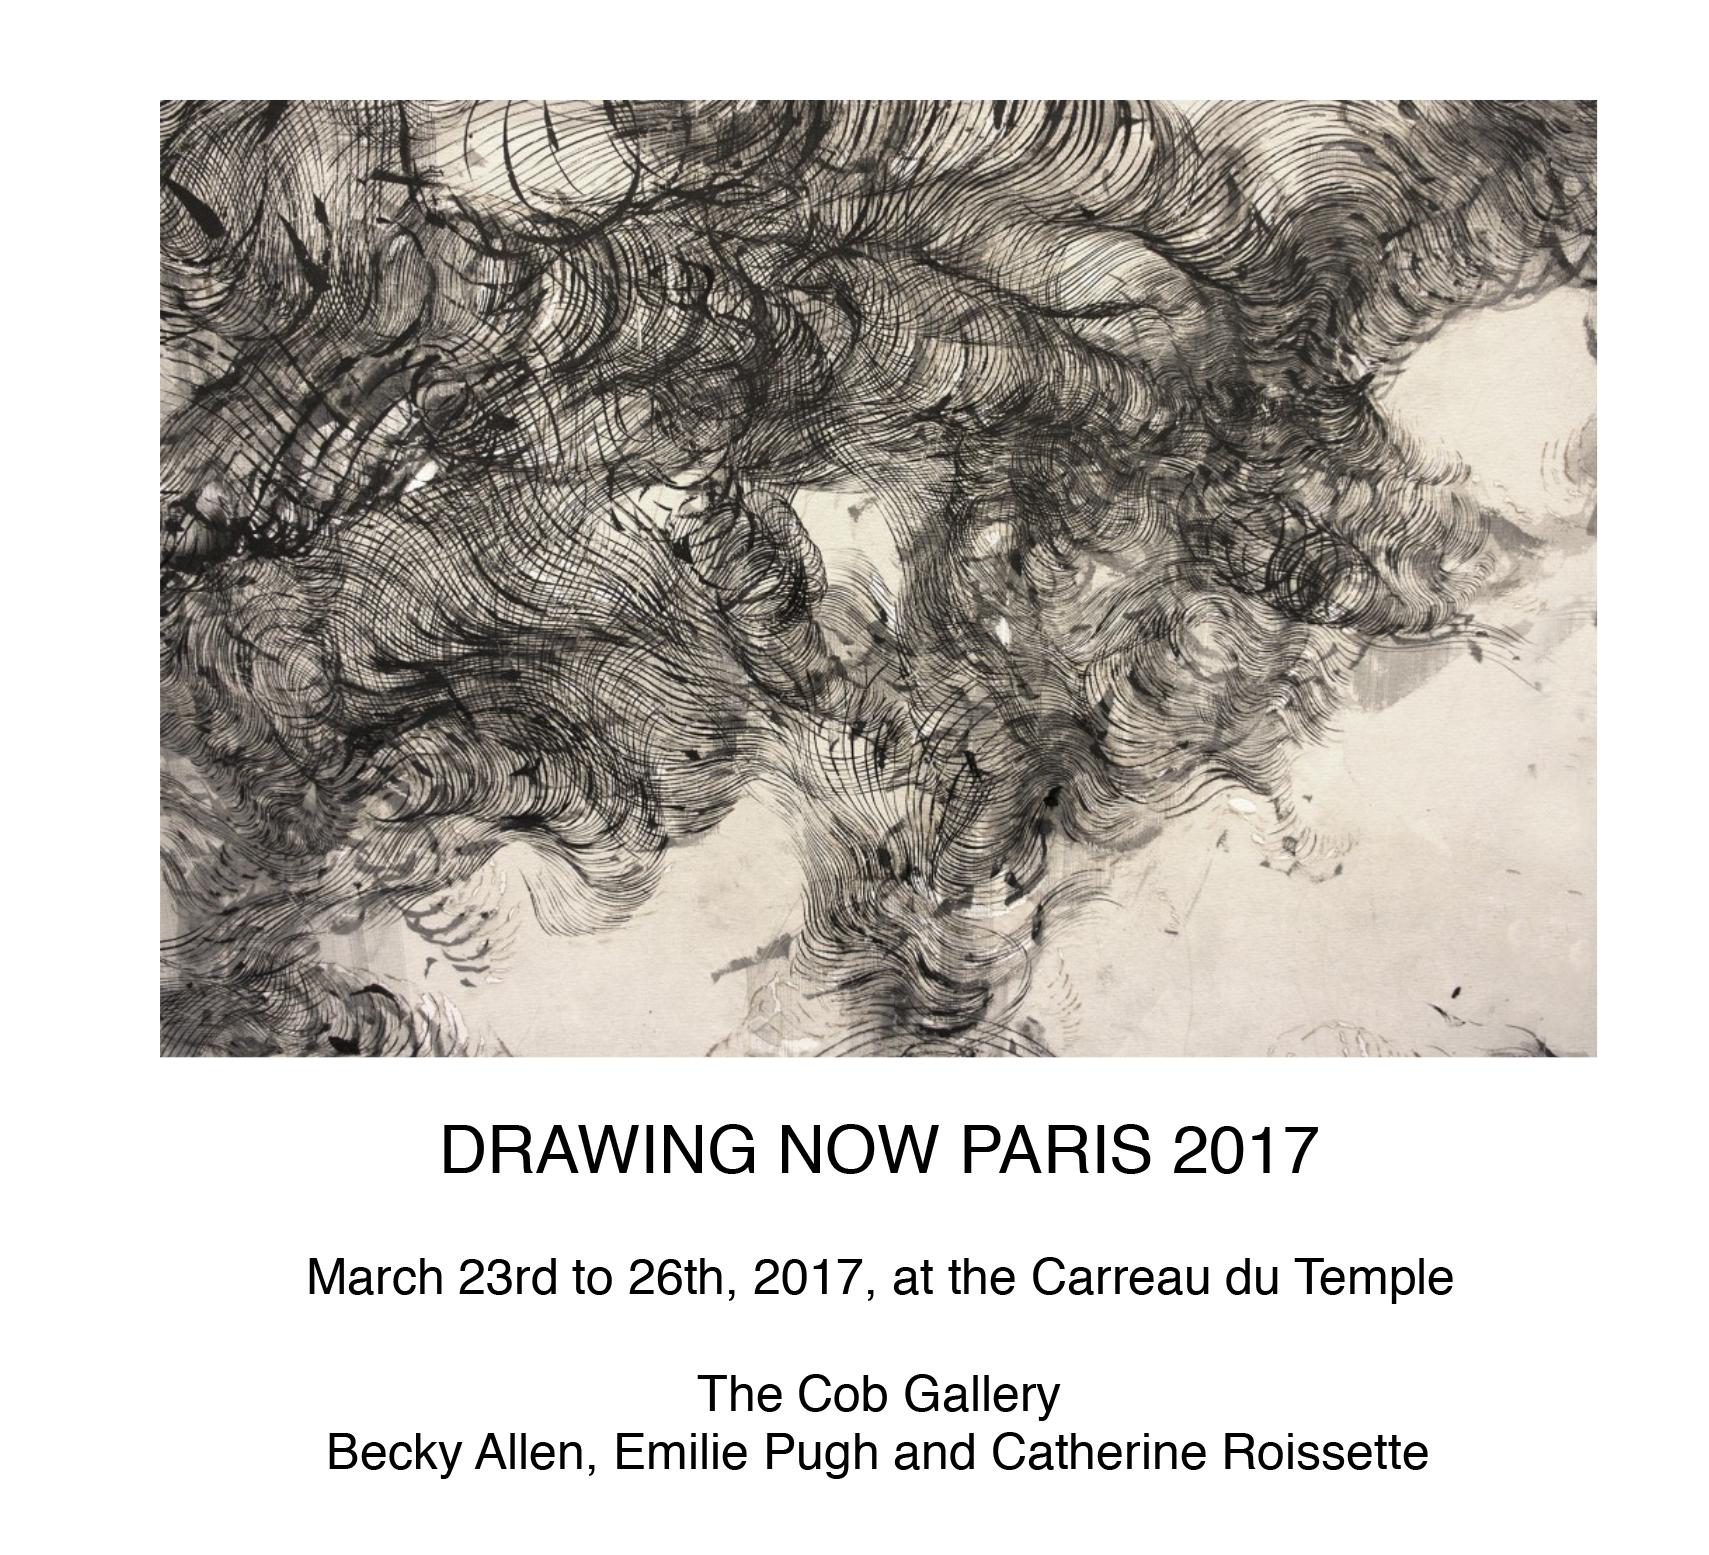 Drawing Now, Cob Gallery, Paris 2017